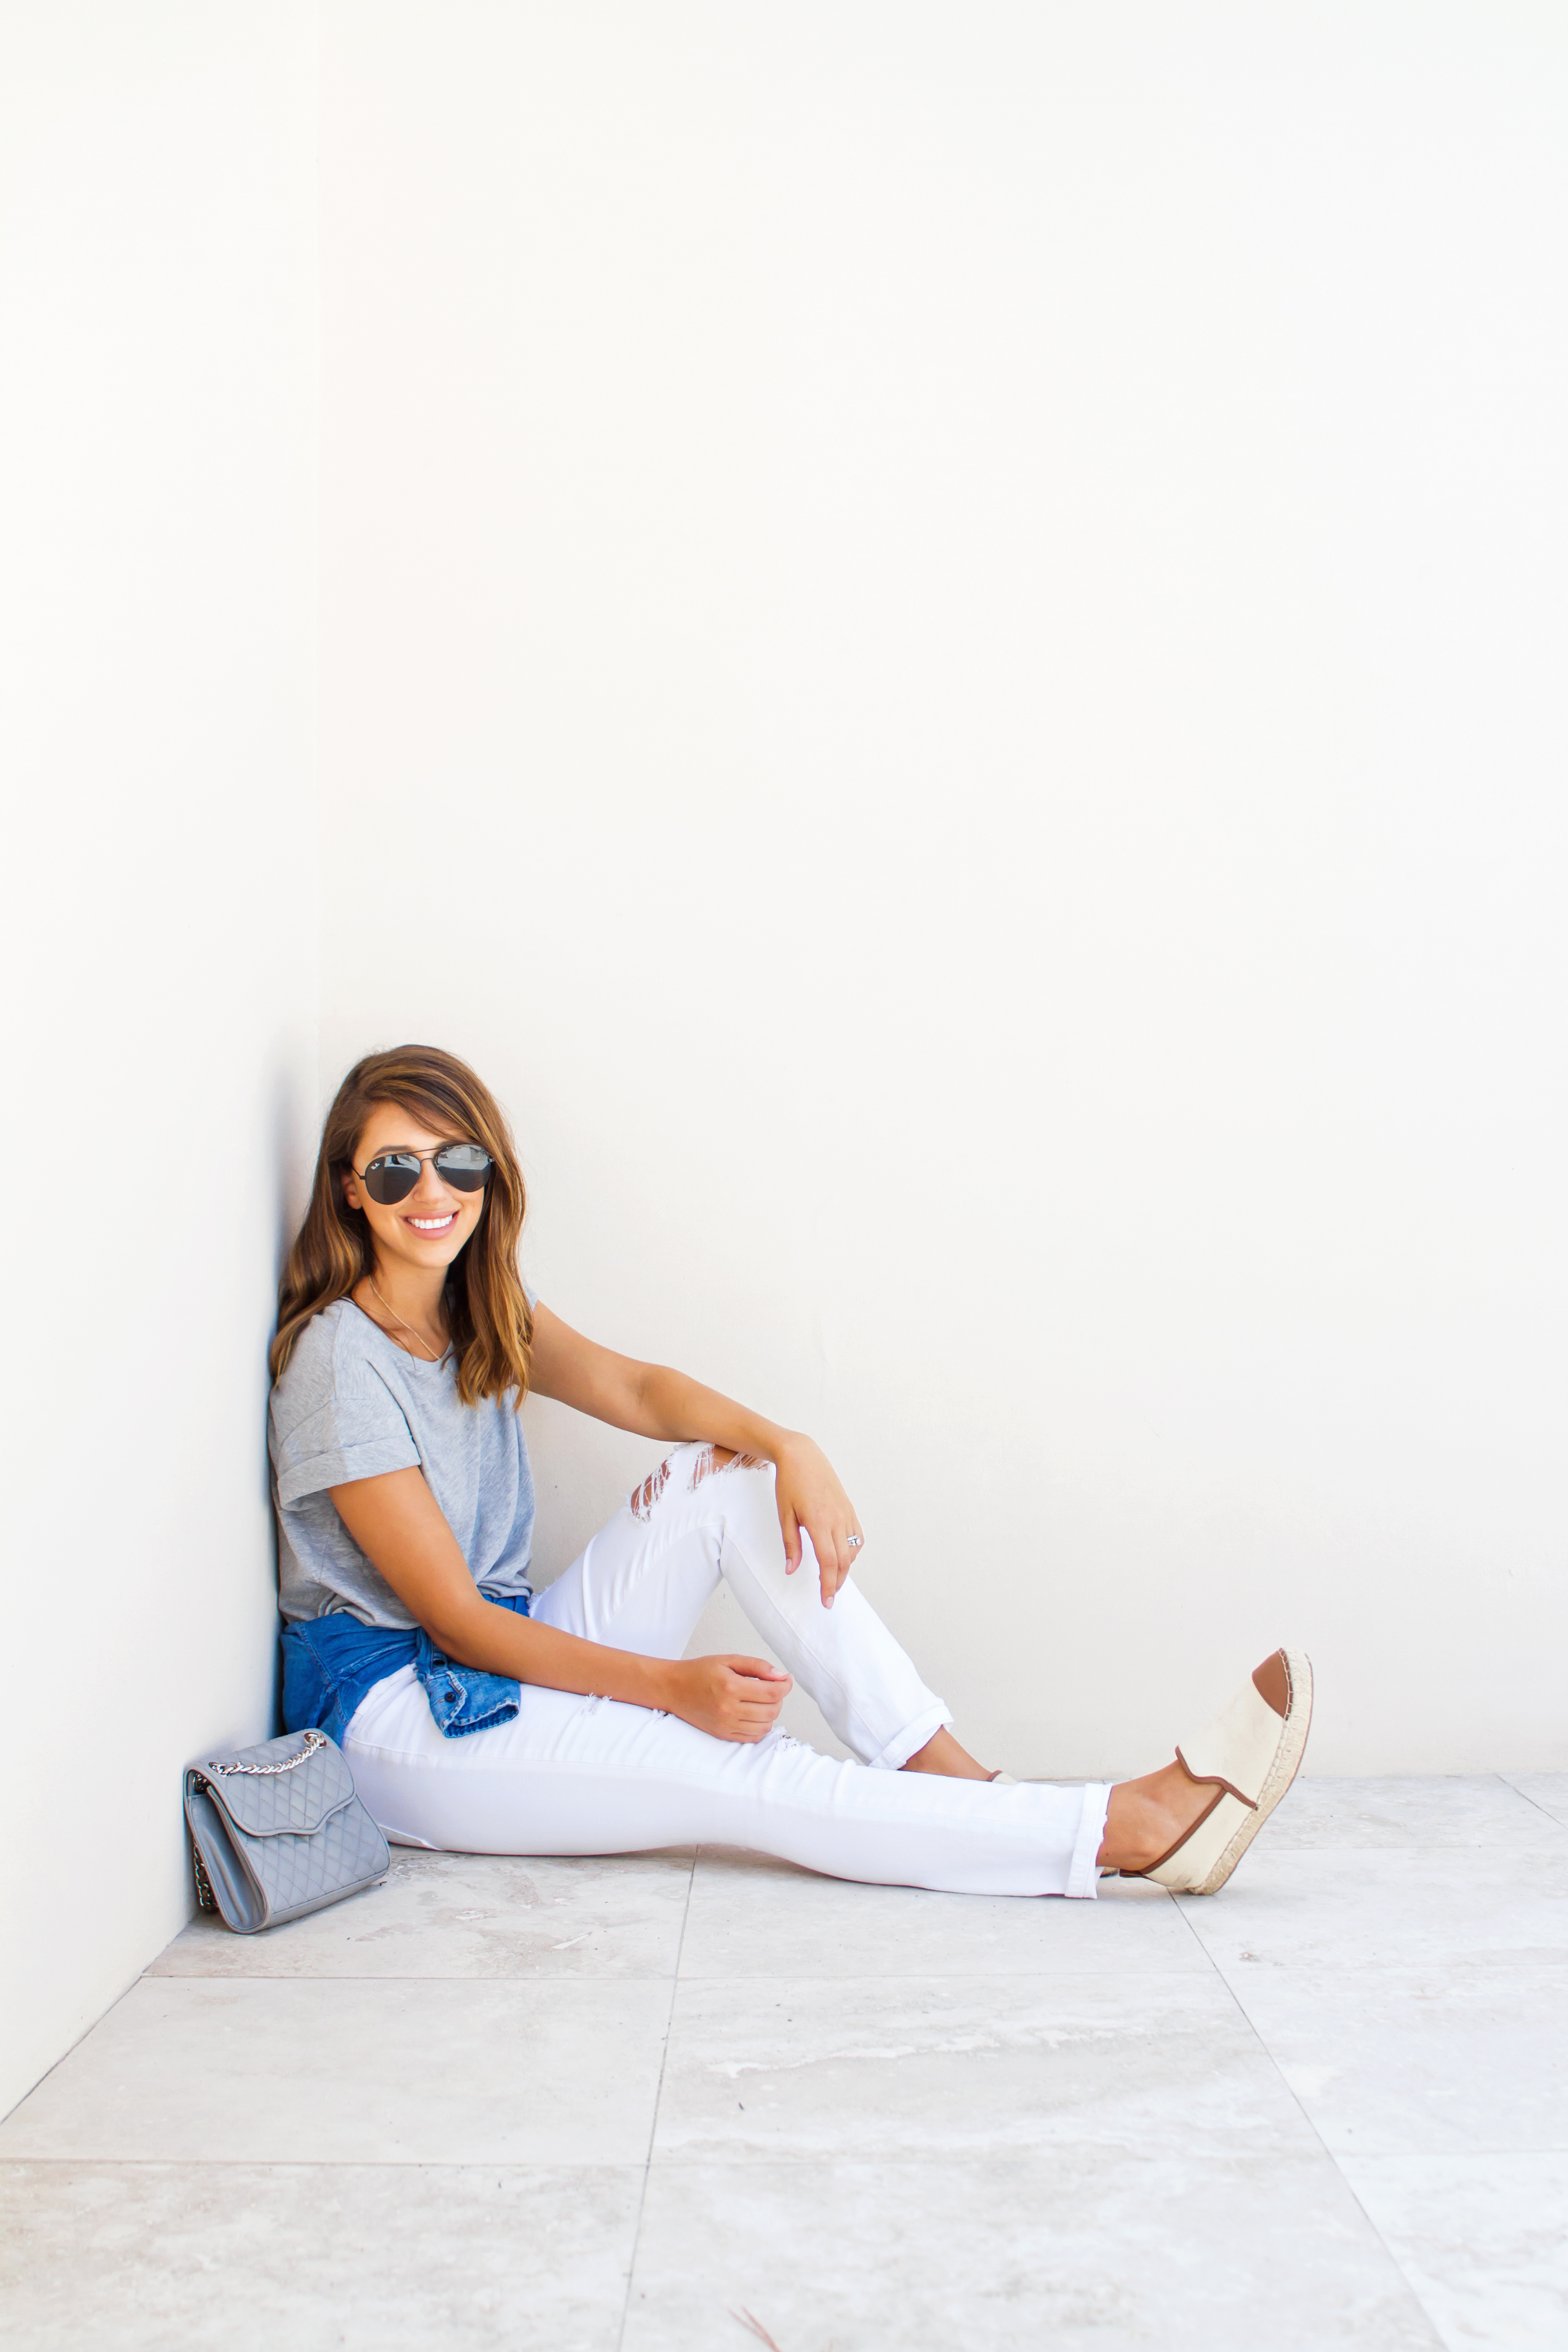 Dress Up Buttercup | Houston Fashion Blog - Dede Raad | Back to School